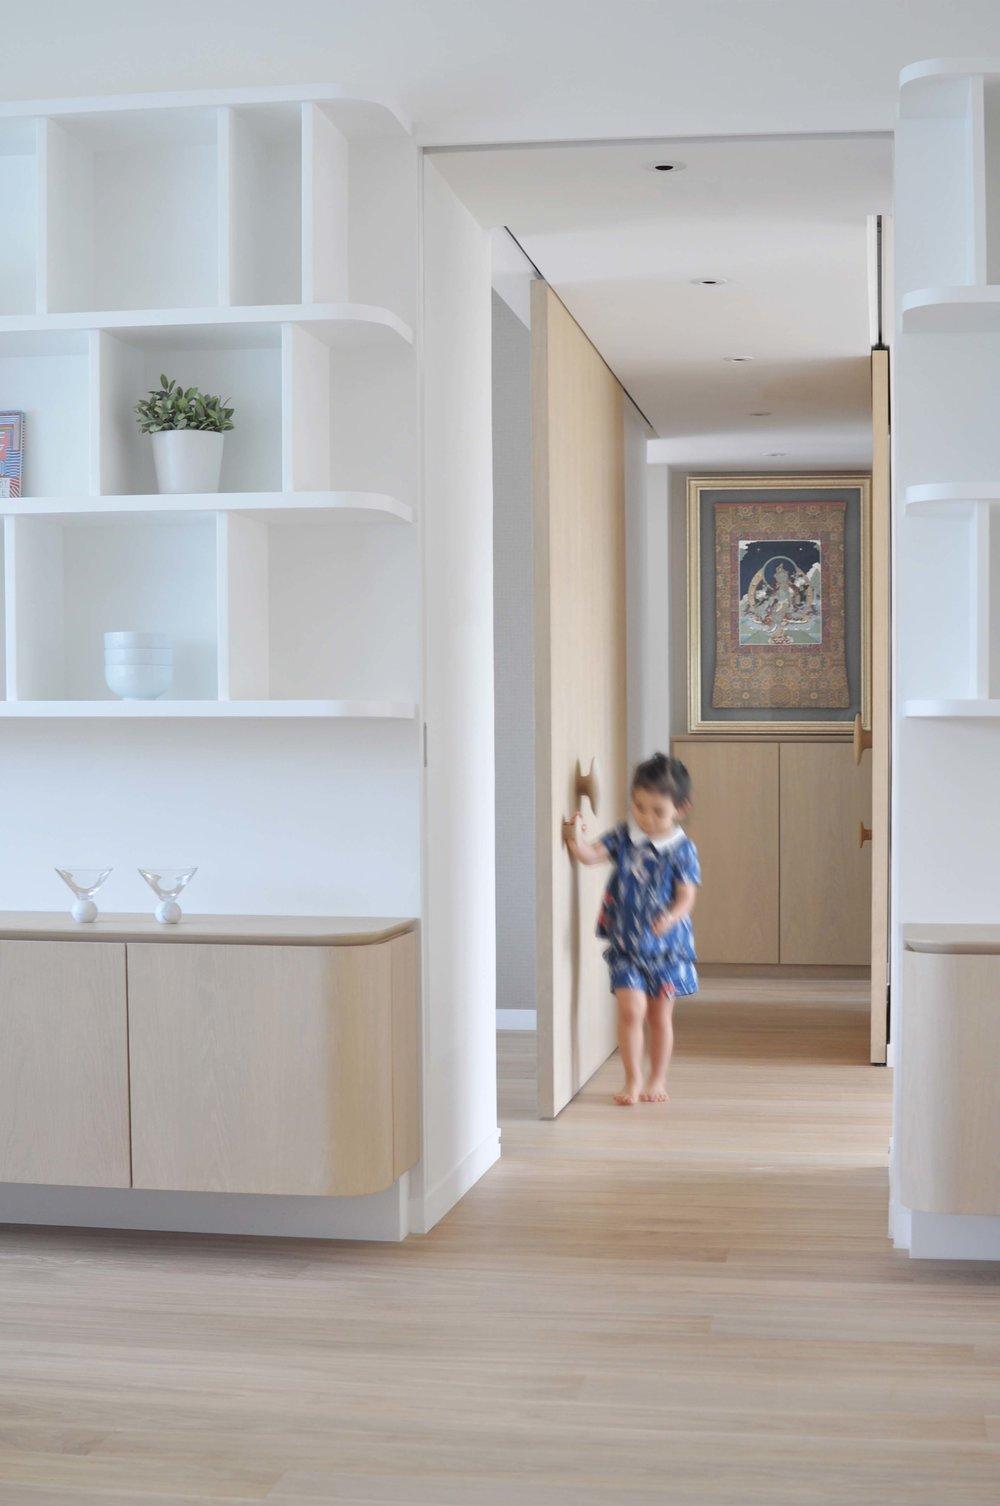 06_Bean Buro_Residential_Disappearing Corridor.jpg